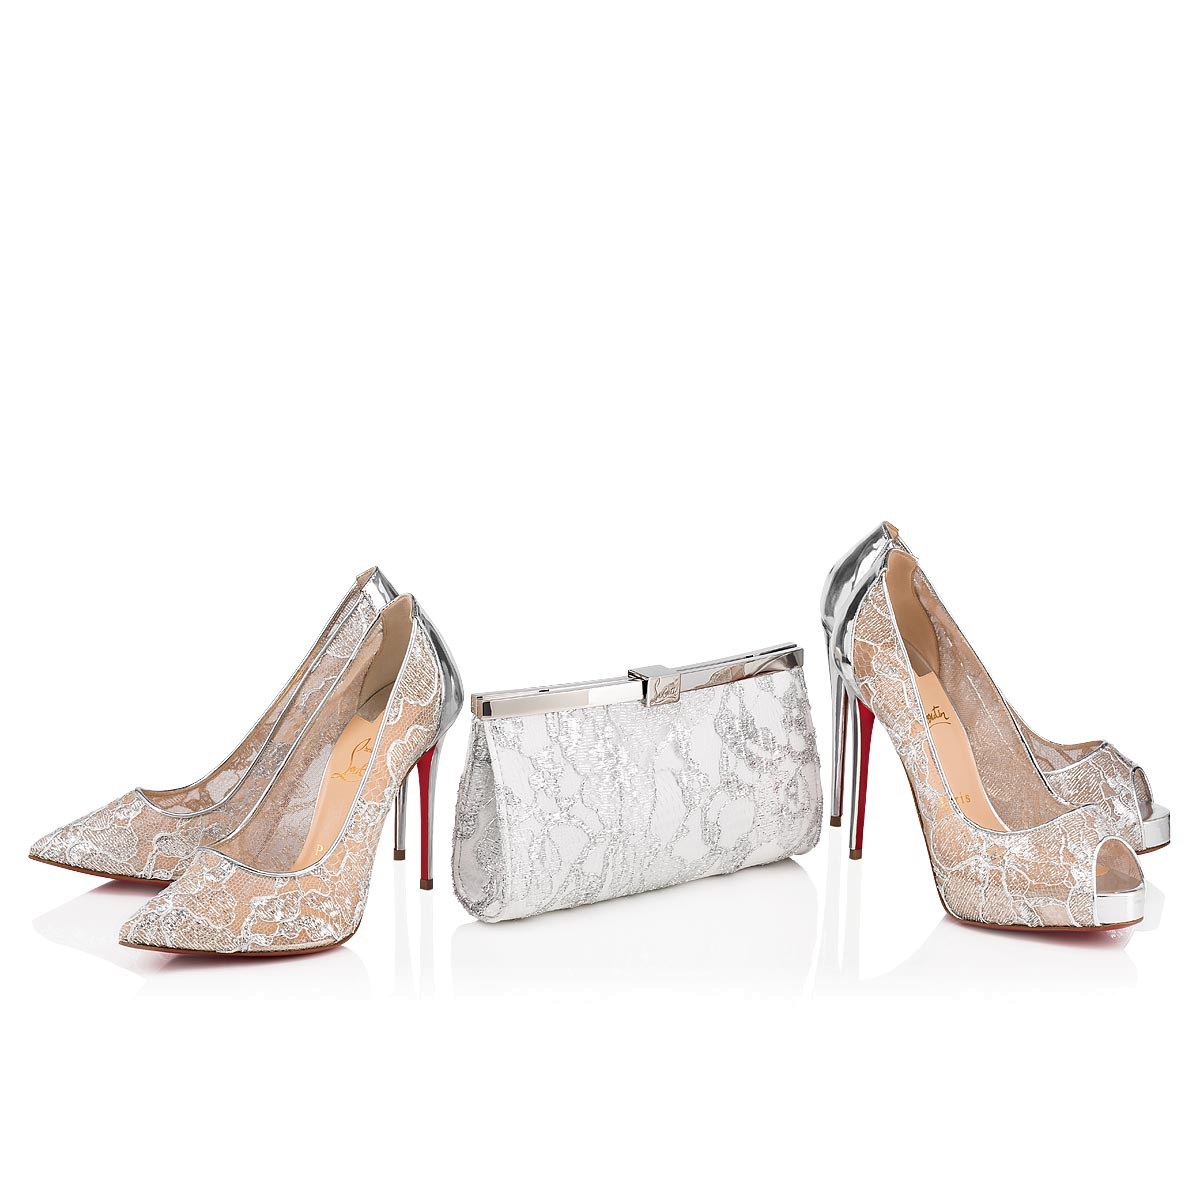 鞋履 - Follies Lace 100 Dentelle - Christian Louboutin